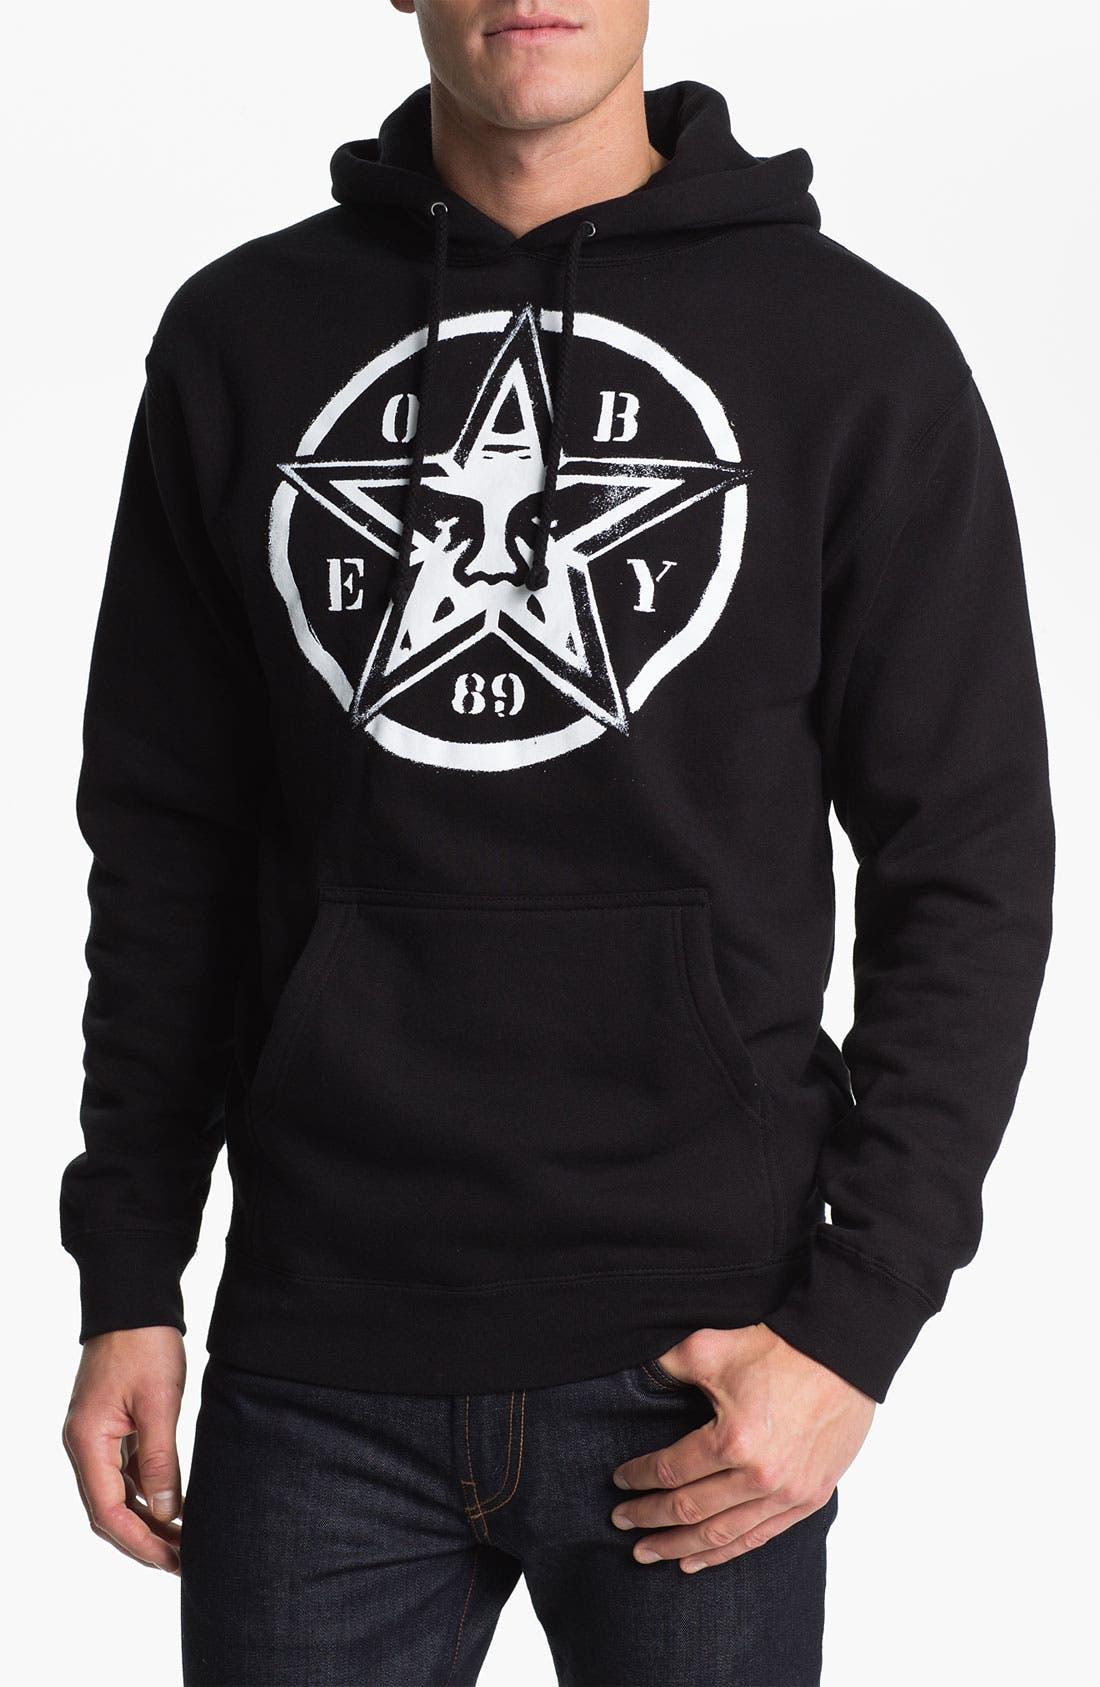 Alternate Image 1 Selected - Obey 'Star Stencil' Regular Fit Hooded Sweatshirt